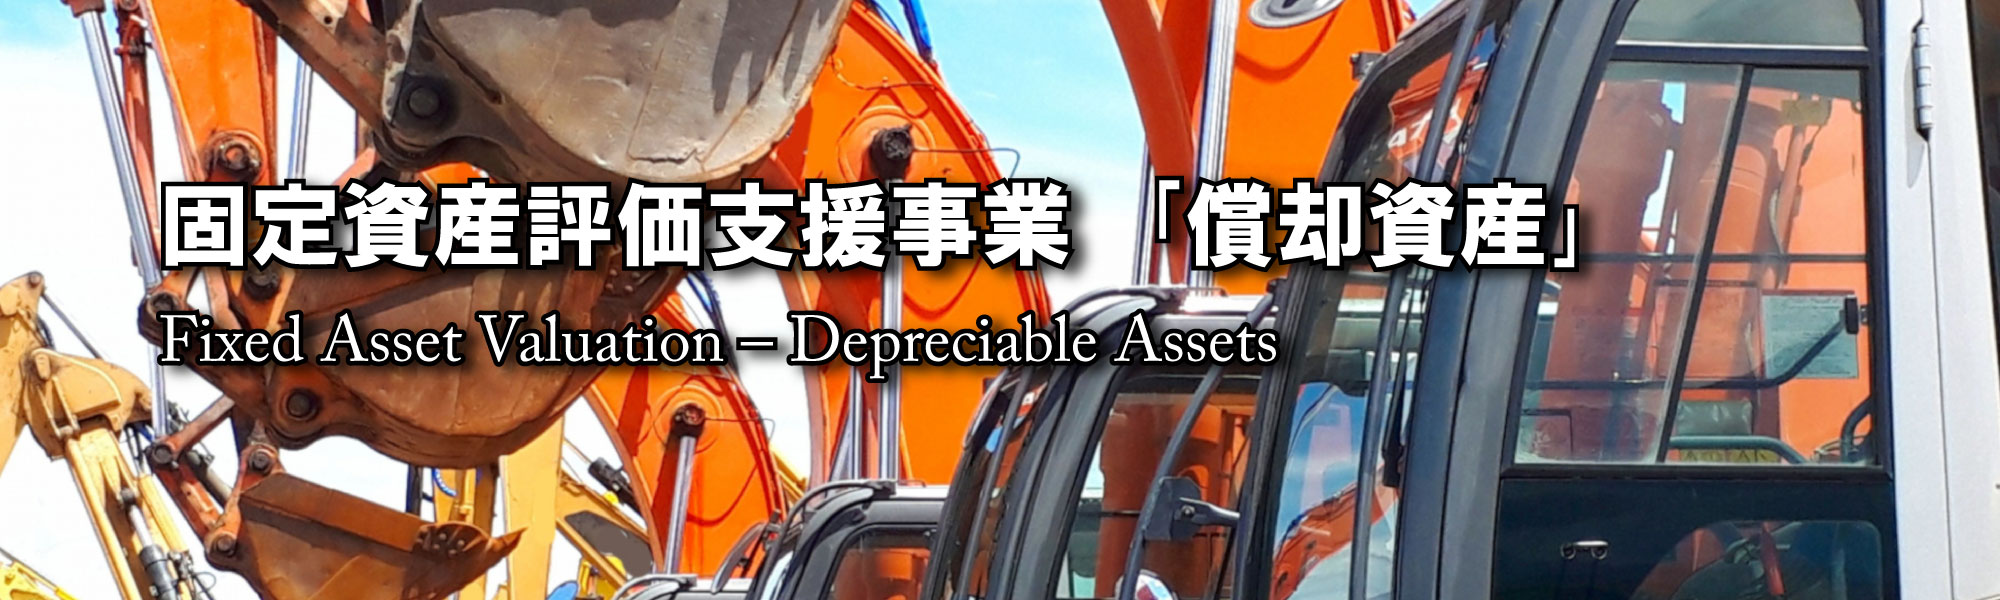 固定資産評価支援事業「償却資産」 Fixed Asset Valuation - Depreciable Assets